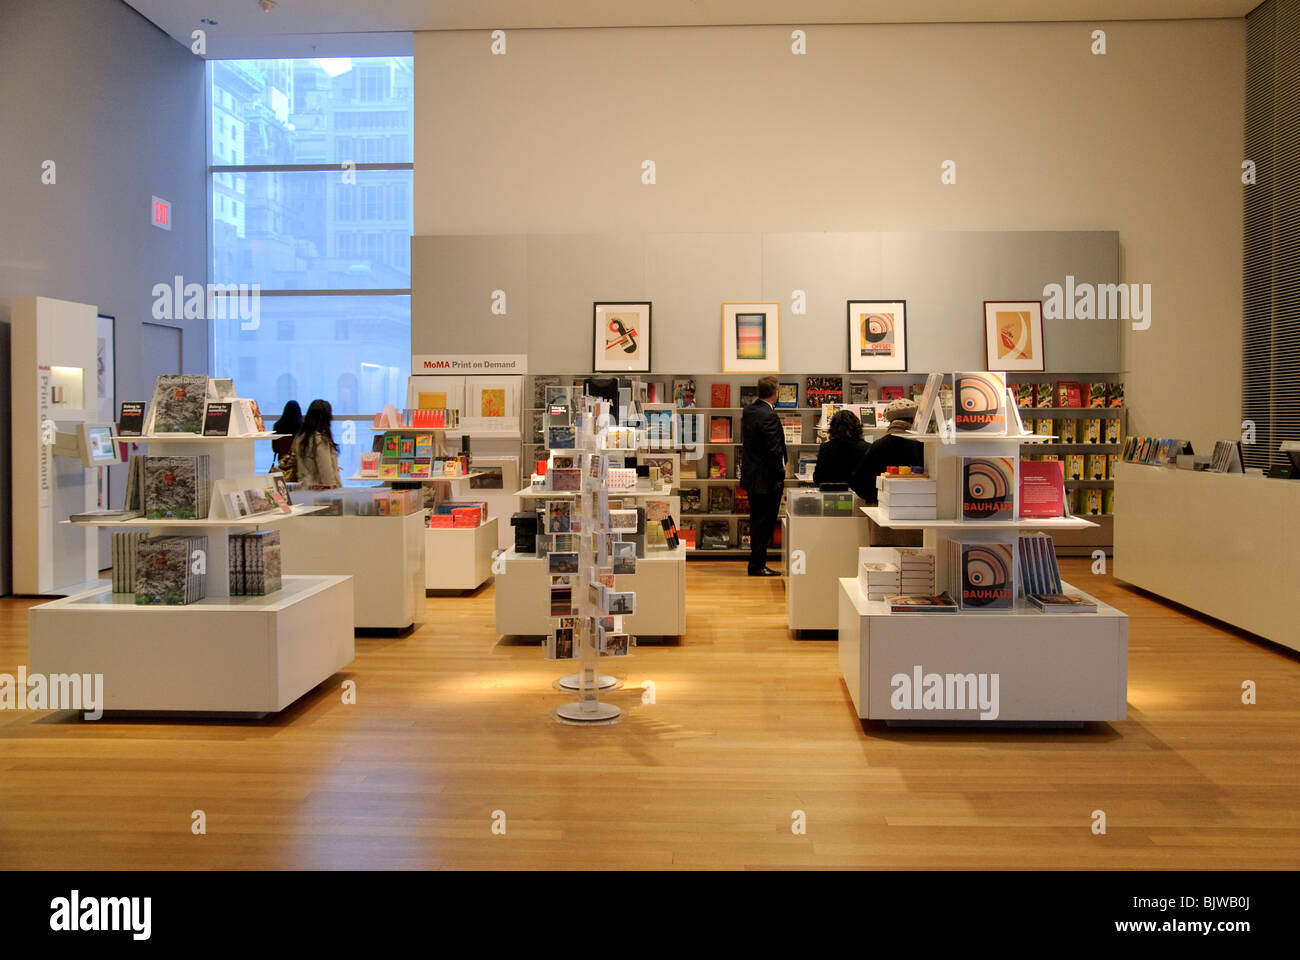 Museum Of Modern Art Store New York Stock Photos   Museum Of Modern ... effb3fb5d847